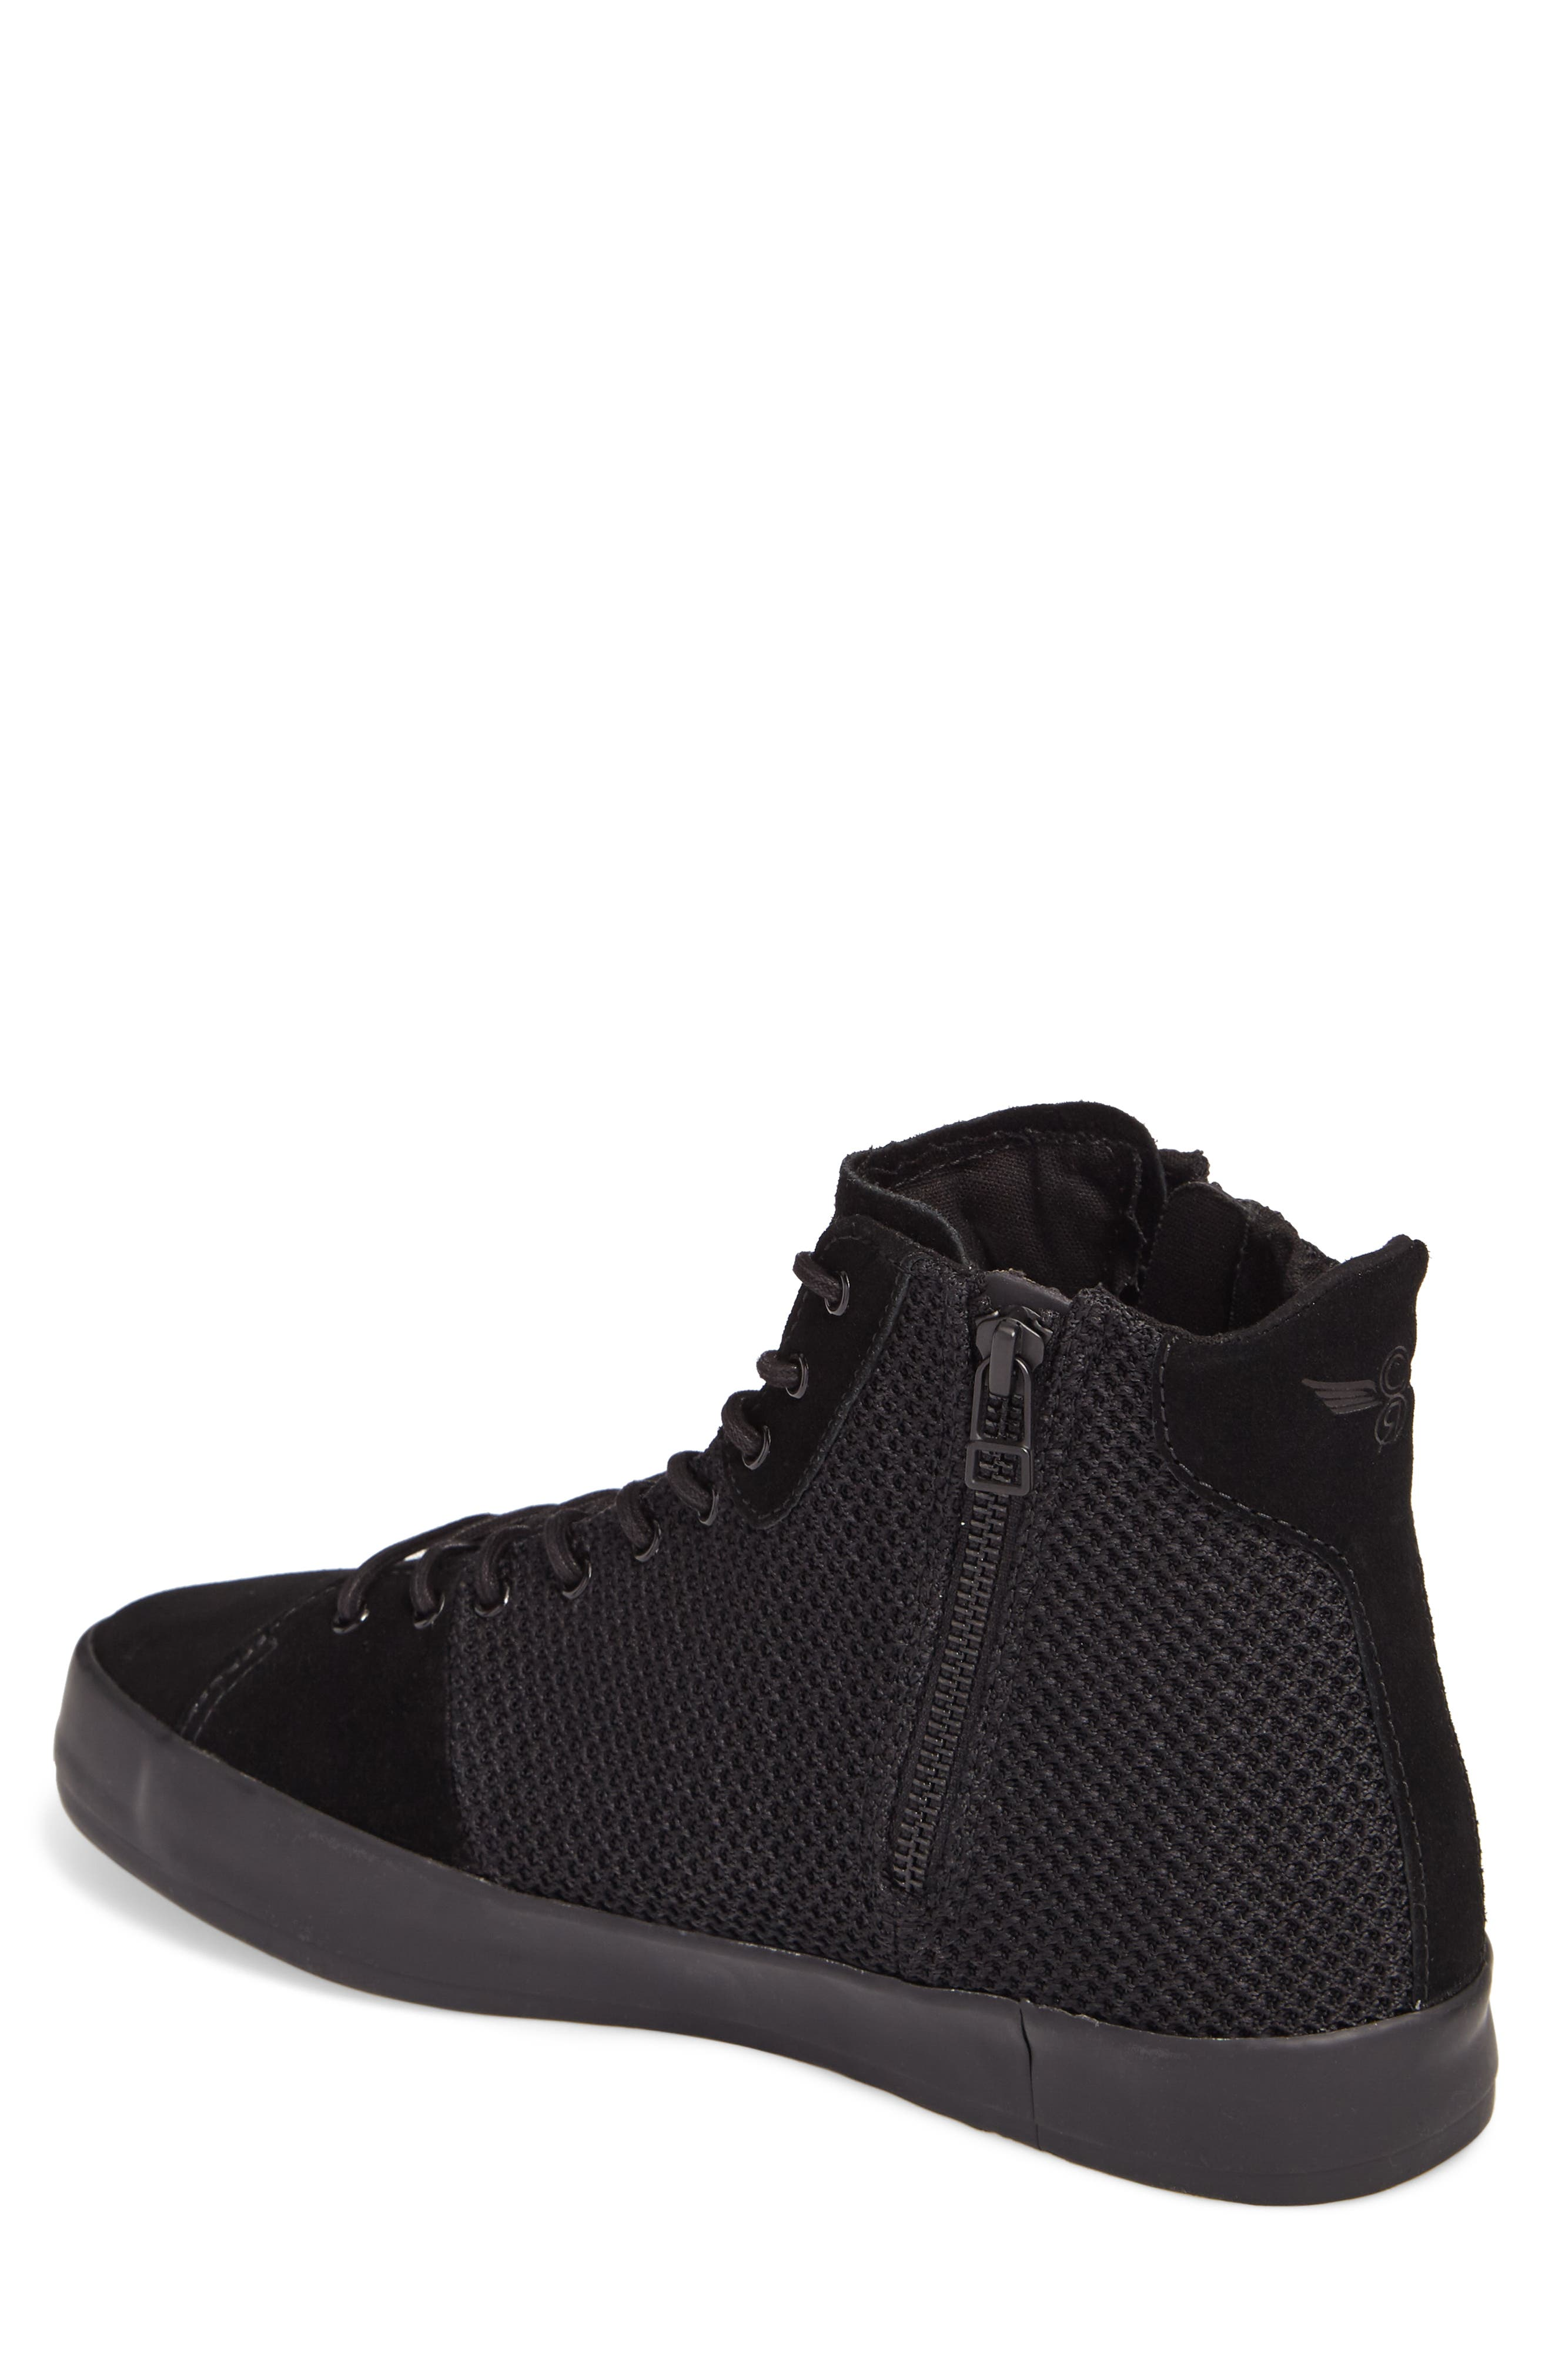 Carda Hi Sneaker,                             Alternate thumbnail 2, color,                             003